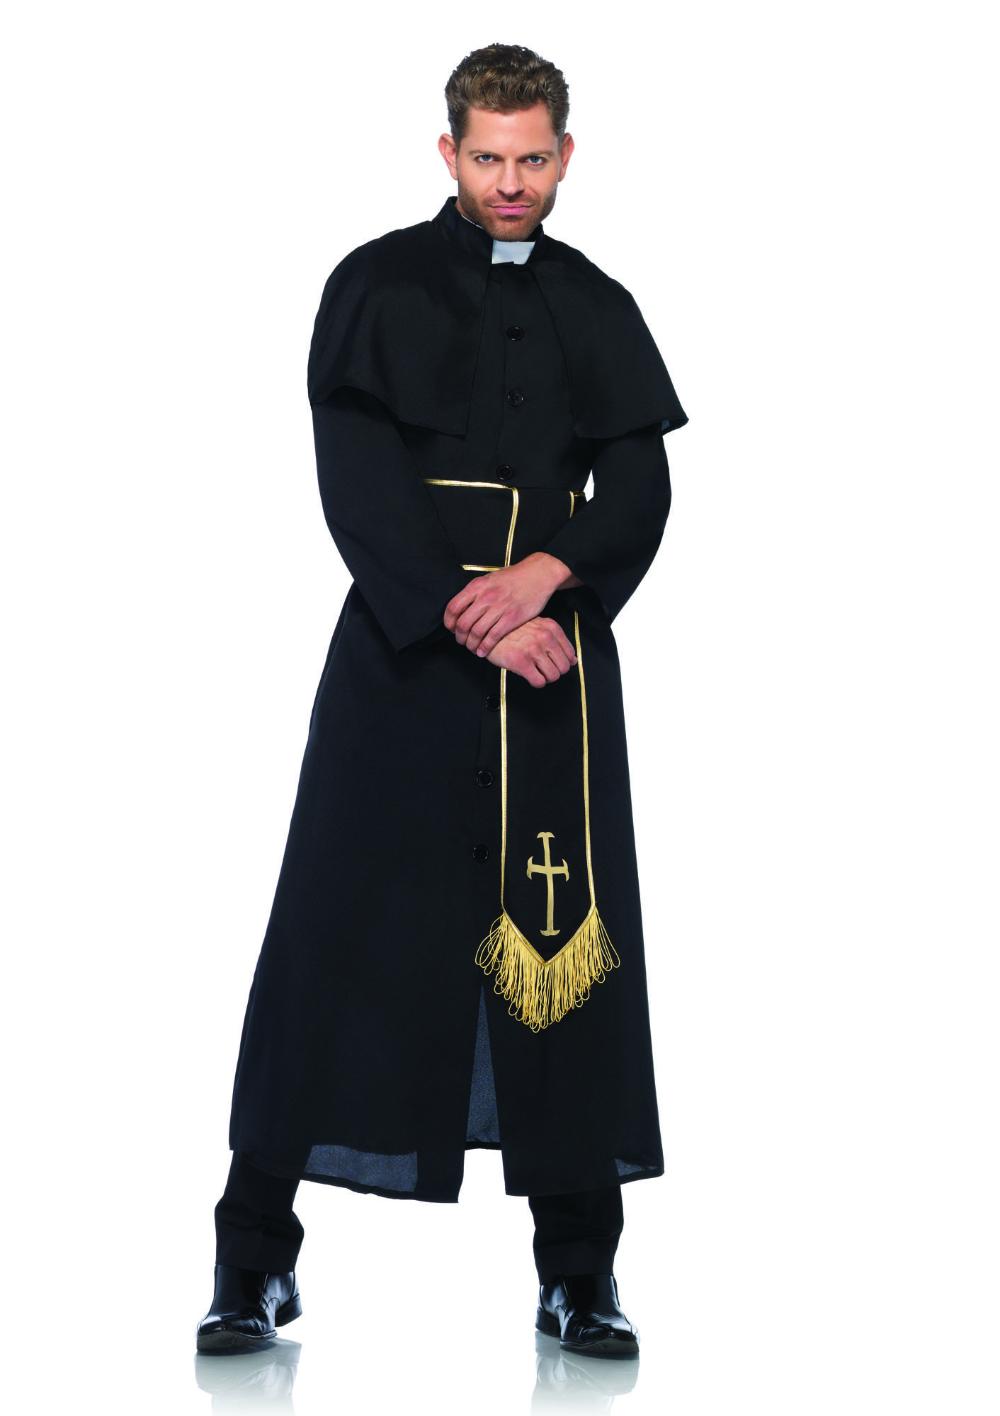 Catholic Priest Mens Robe /& Clerical Collar Funny Halloween Spiritual Costume